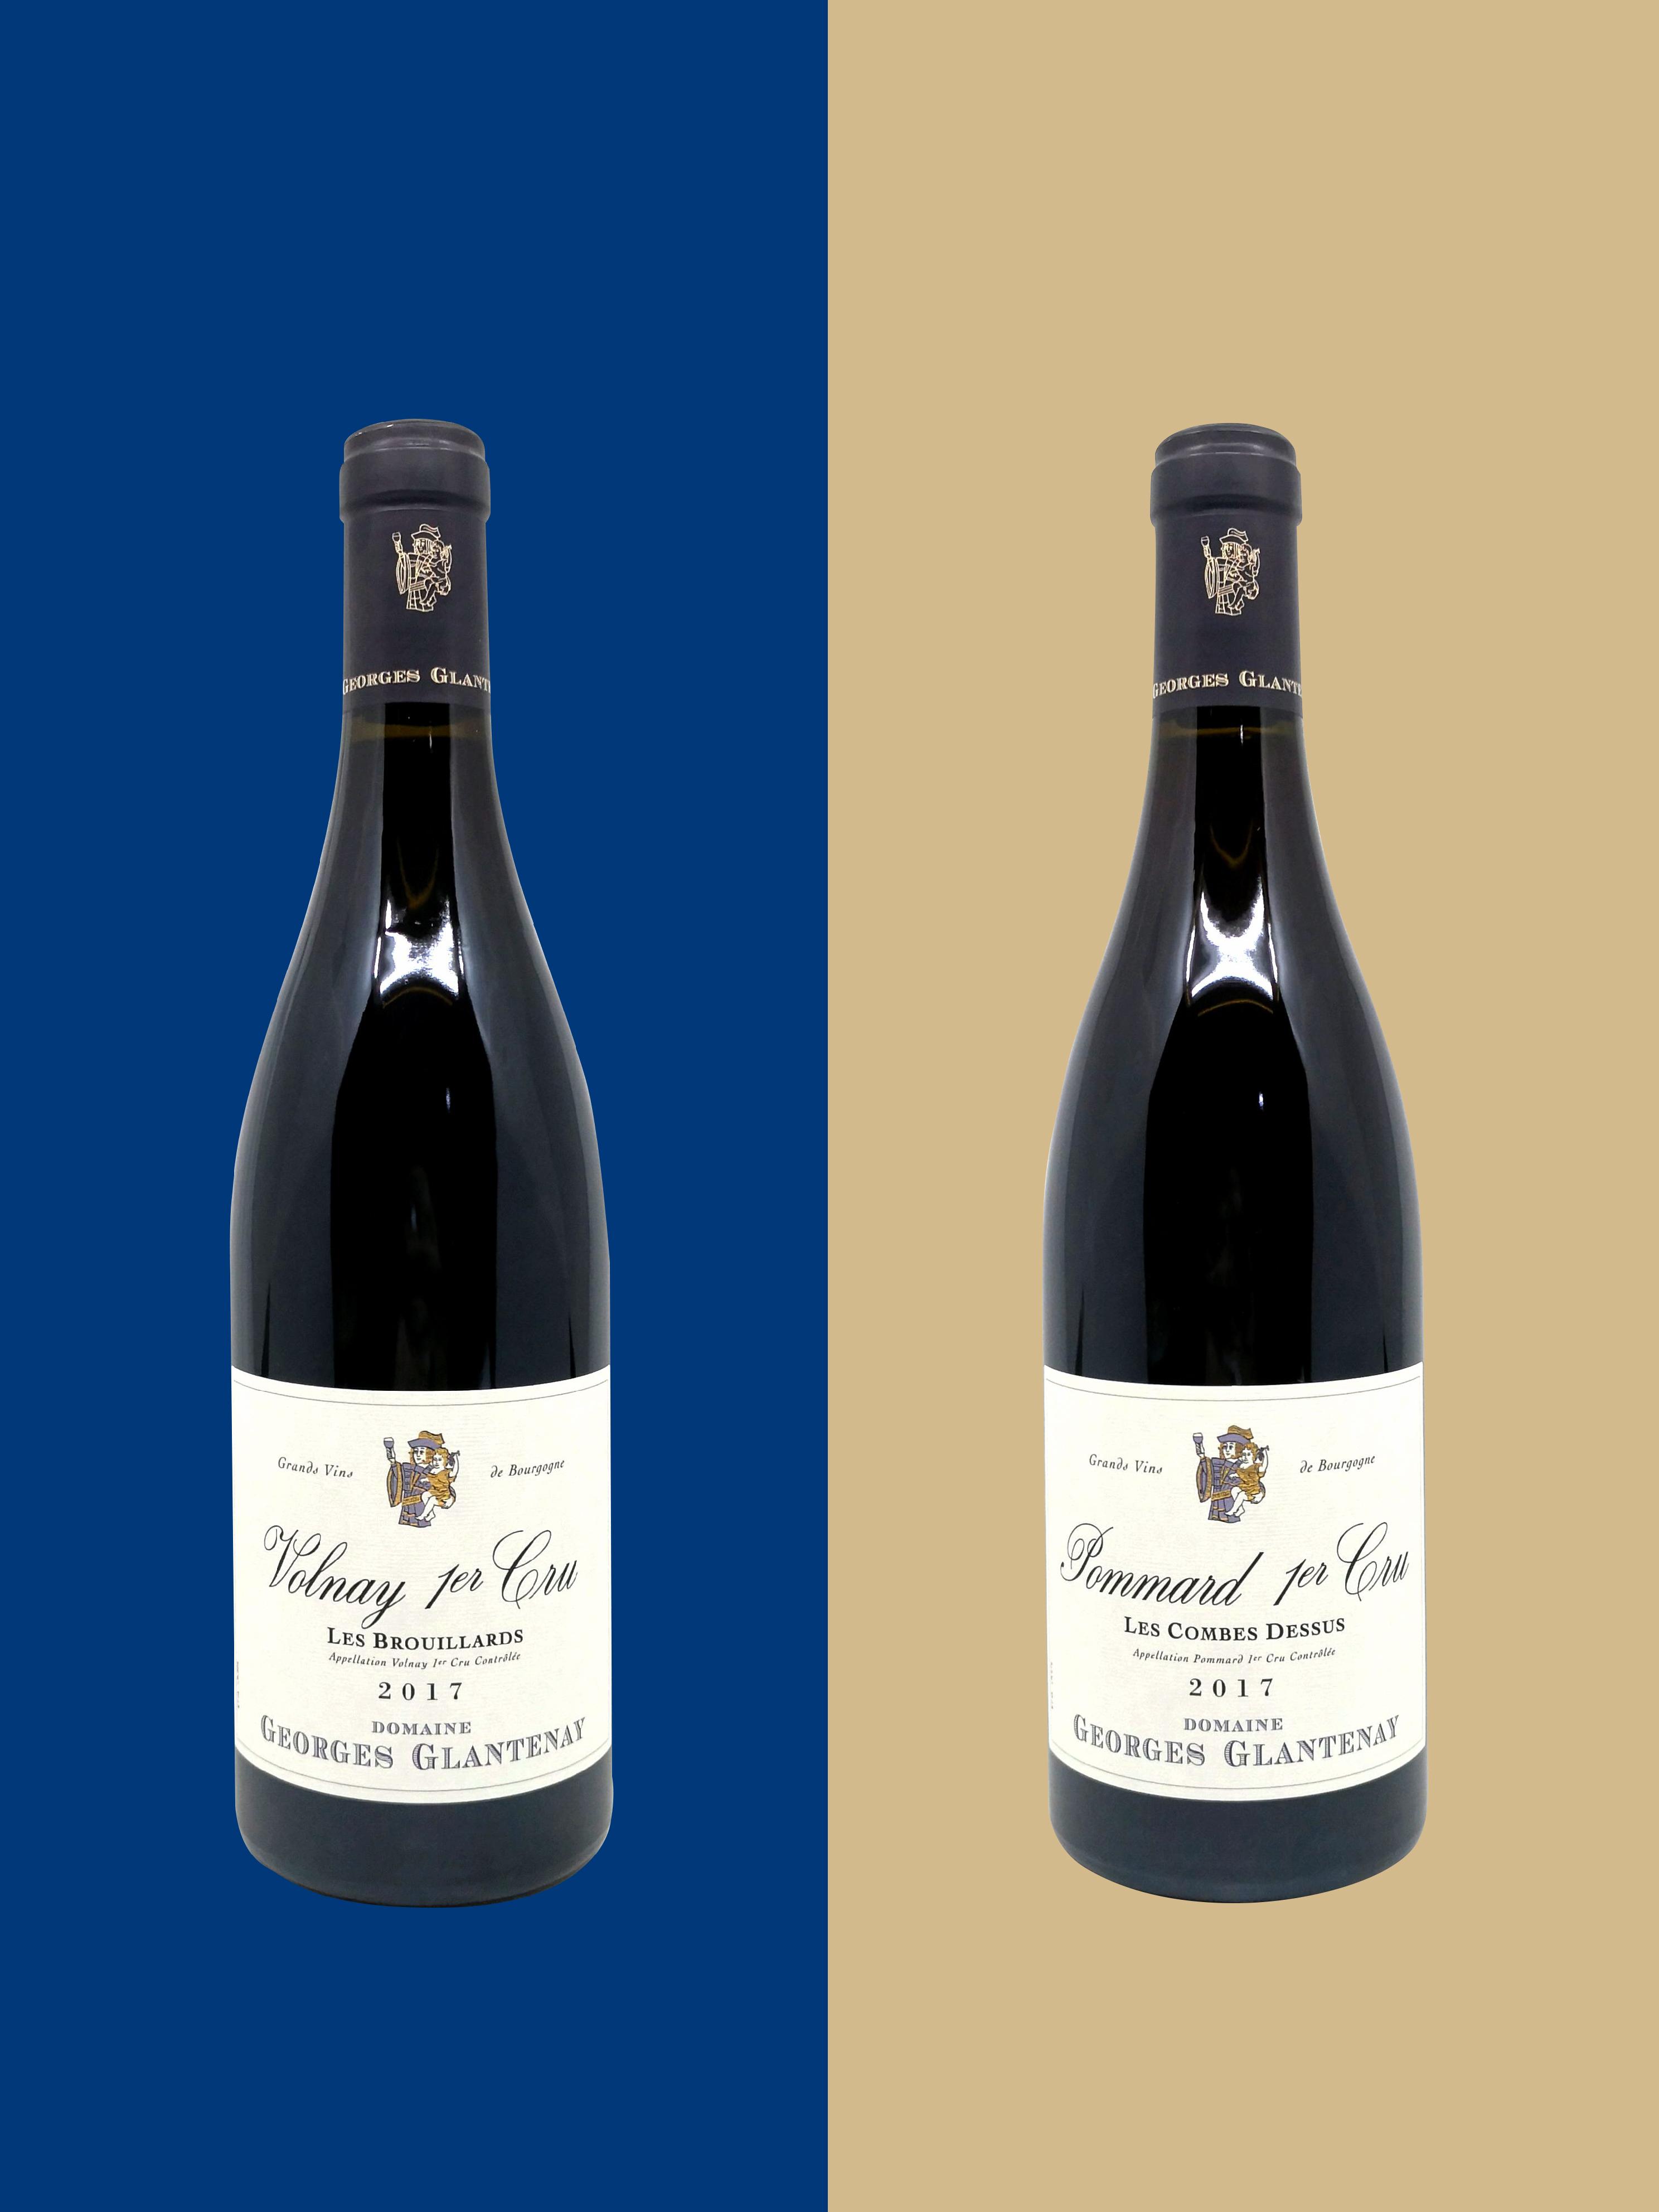 Georges Glantenay 2017 Horizontal Wine Tasting Set